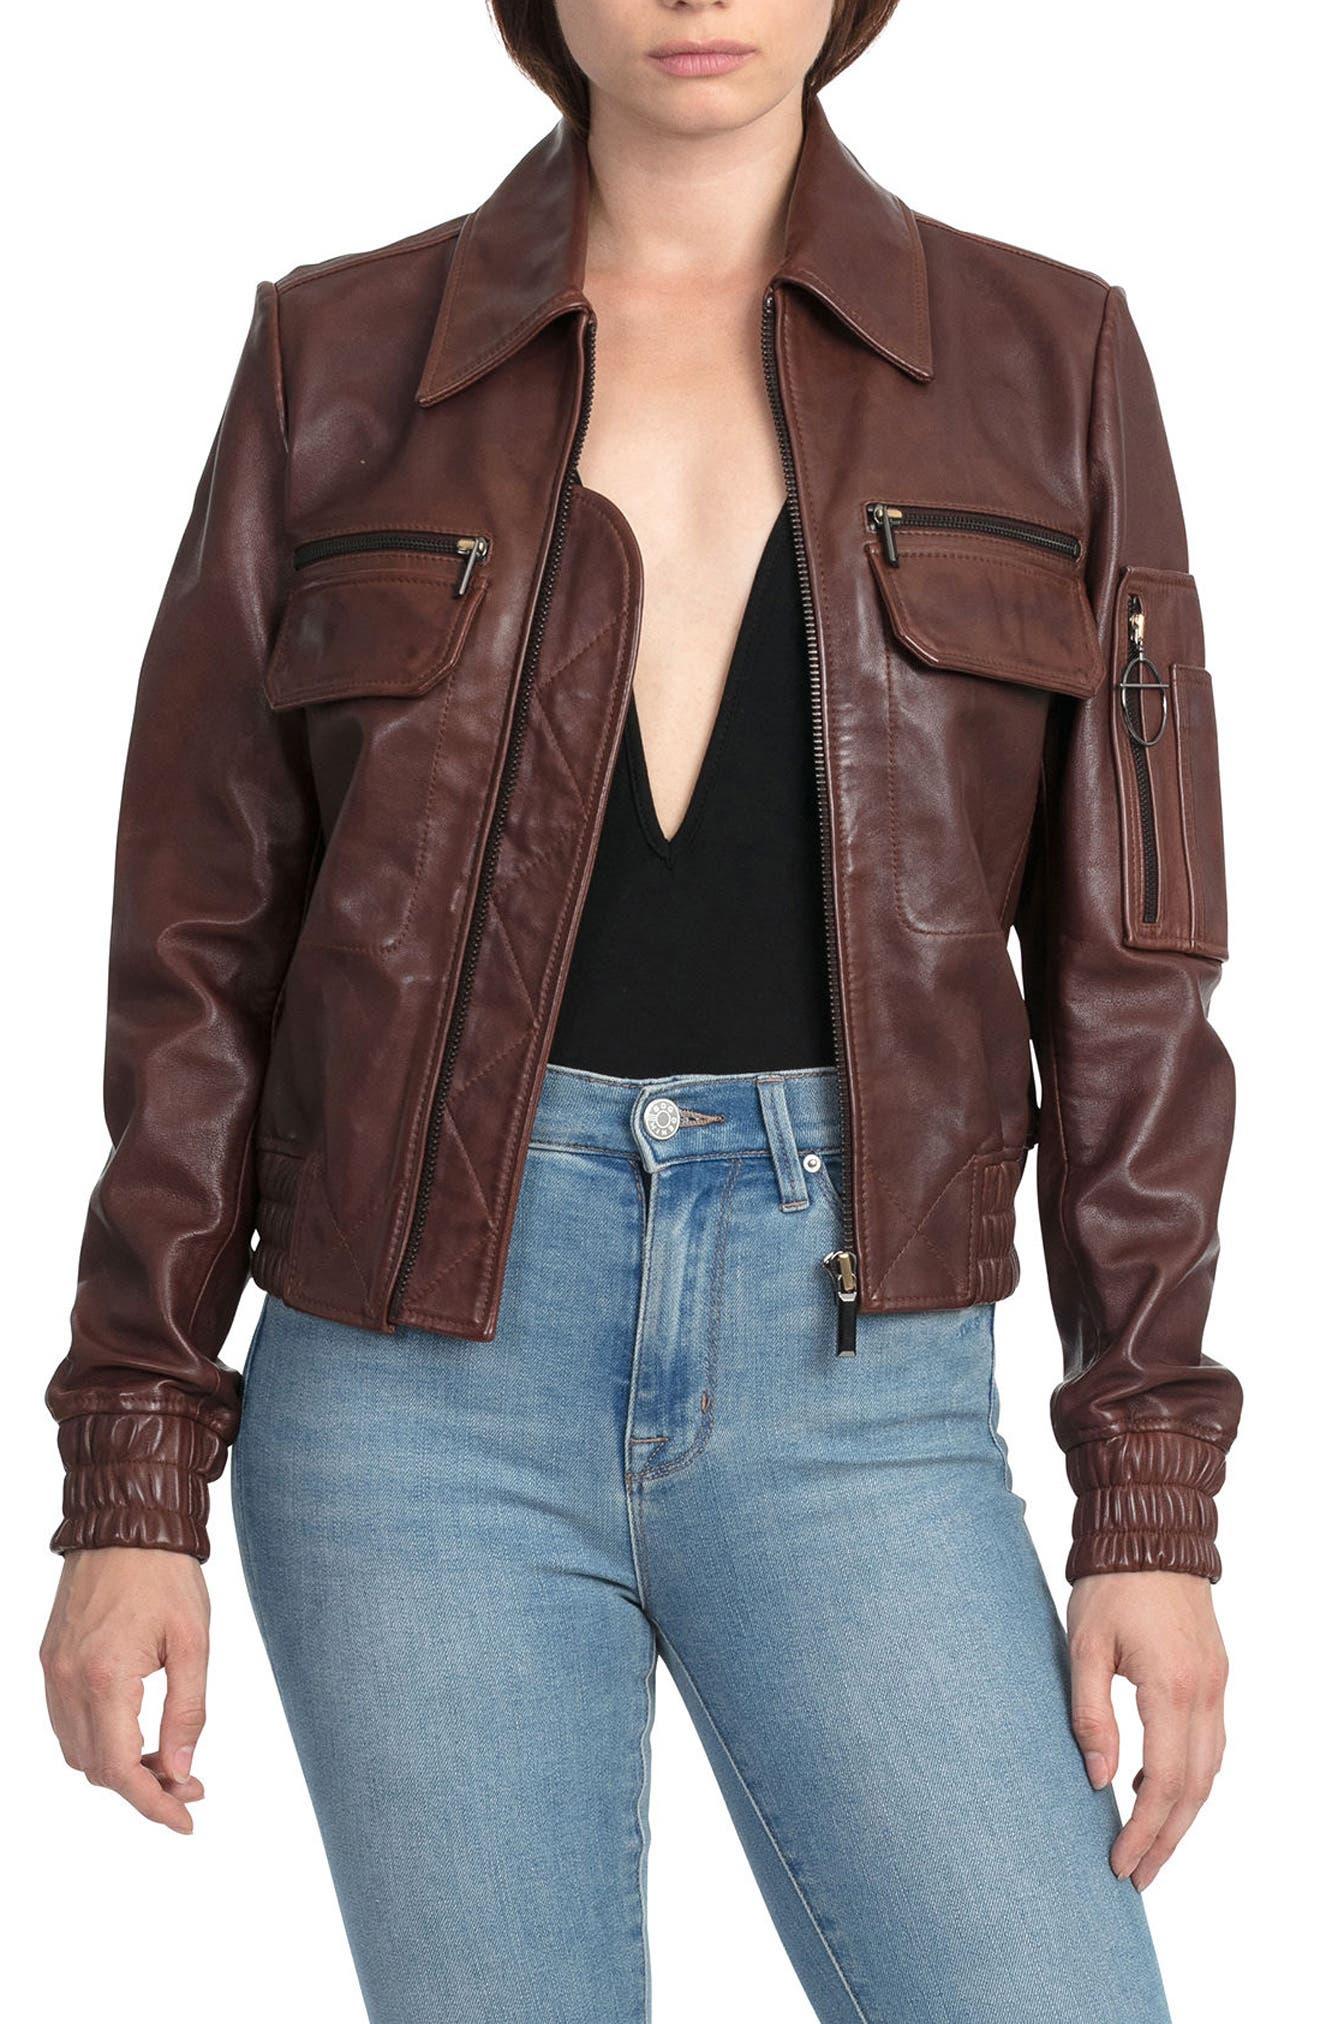 BAGATELLE CITY Bagatelle The Aviator Leather Jacket